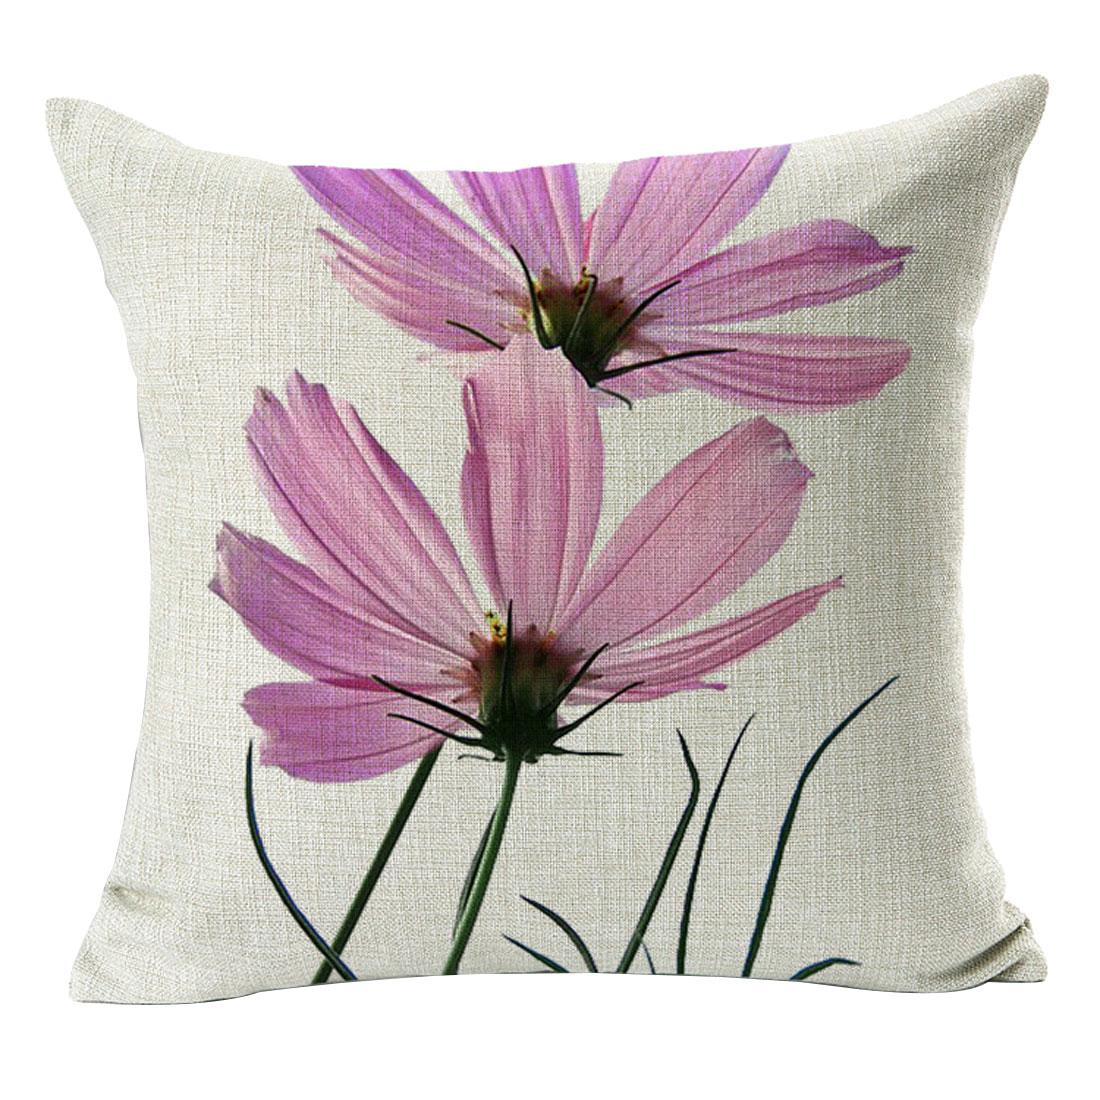 Sofa Cotton Linen Flower Pattern Square Design Waist Throw Pillowcase Pillow Cover